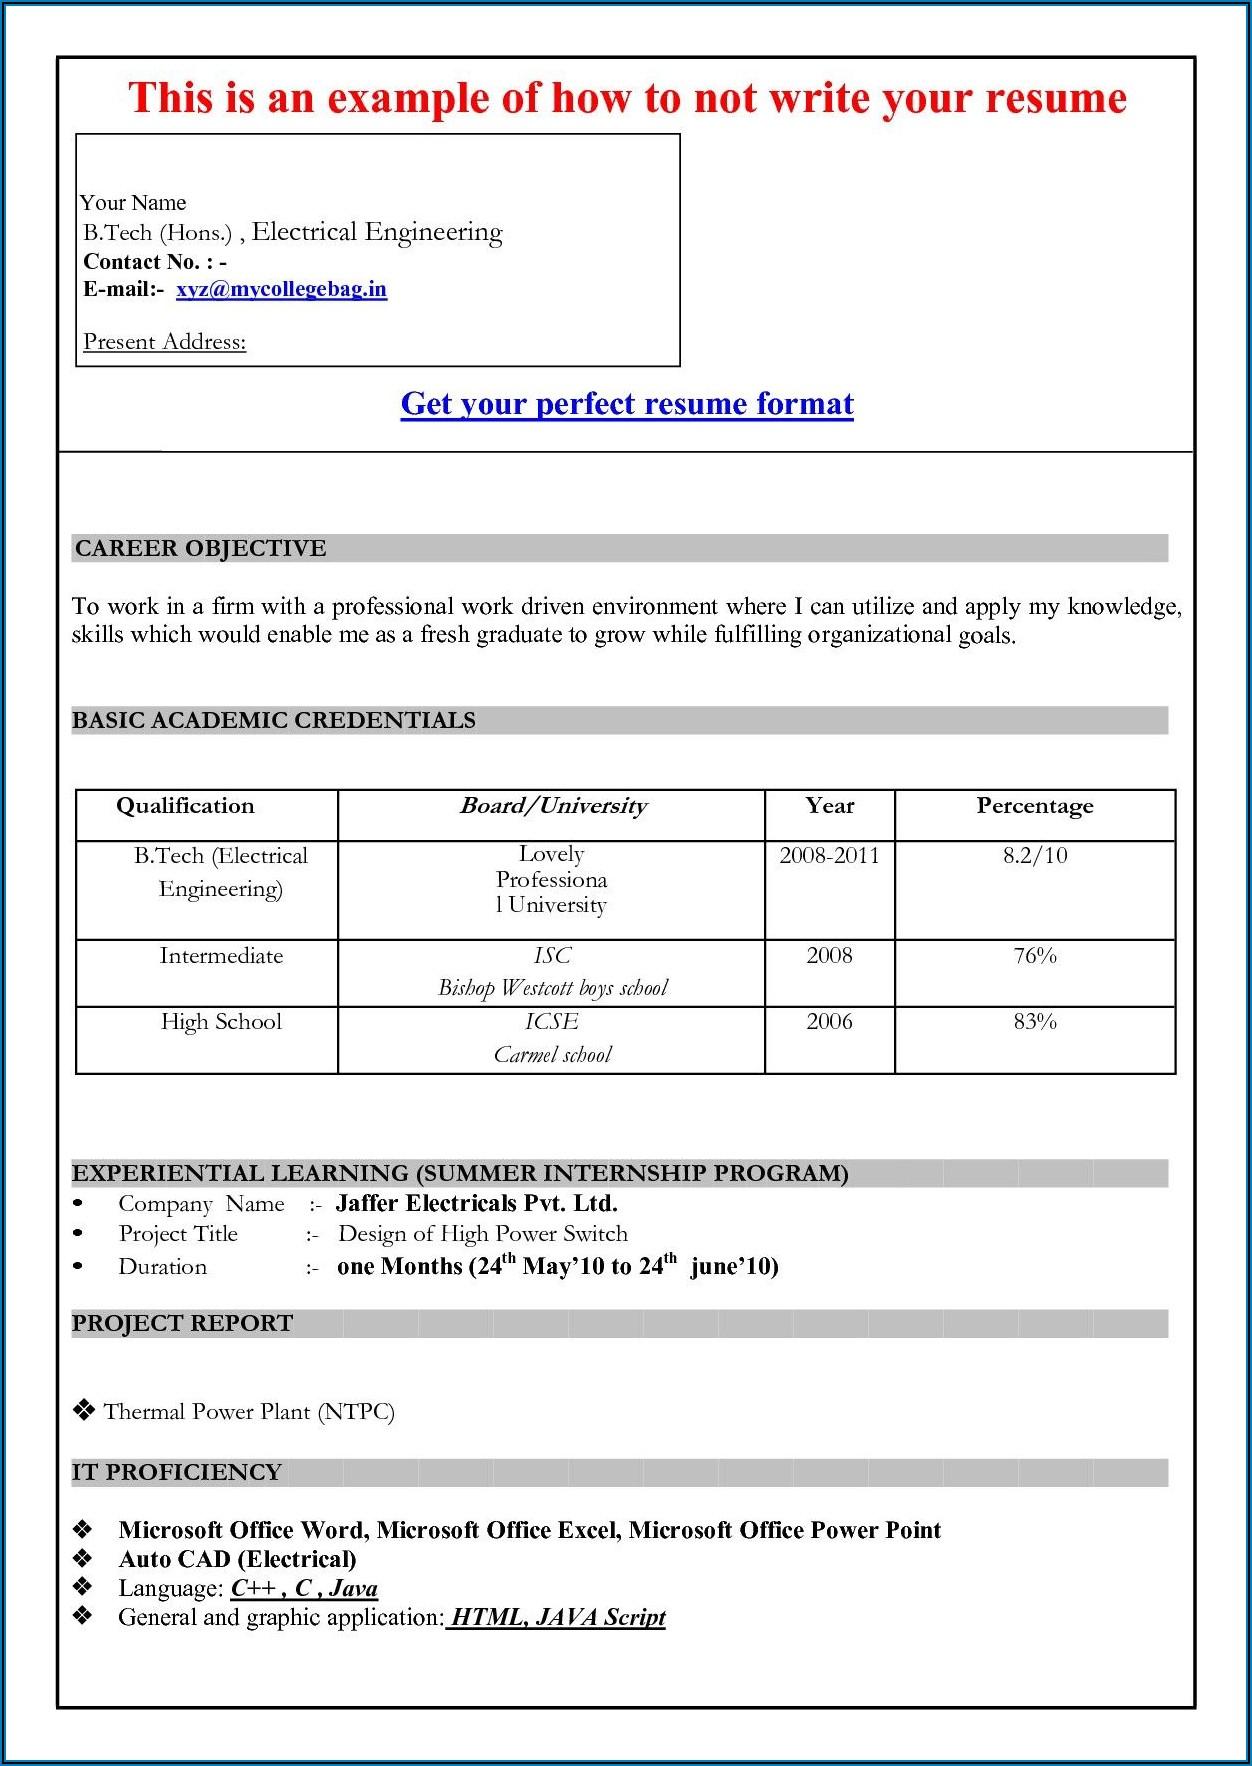 Resume Format In Microsoft Word 2007 Free Download